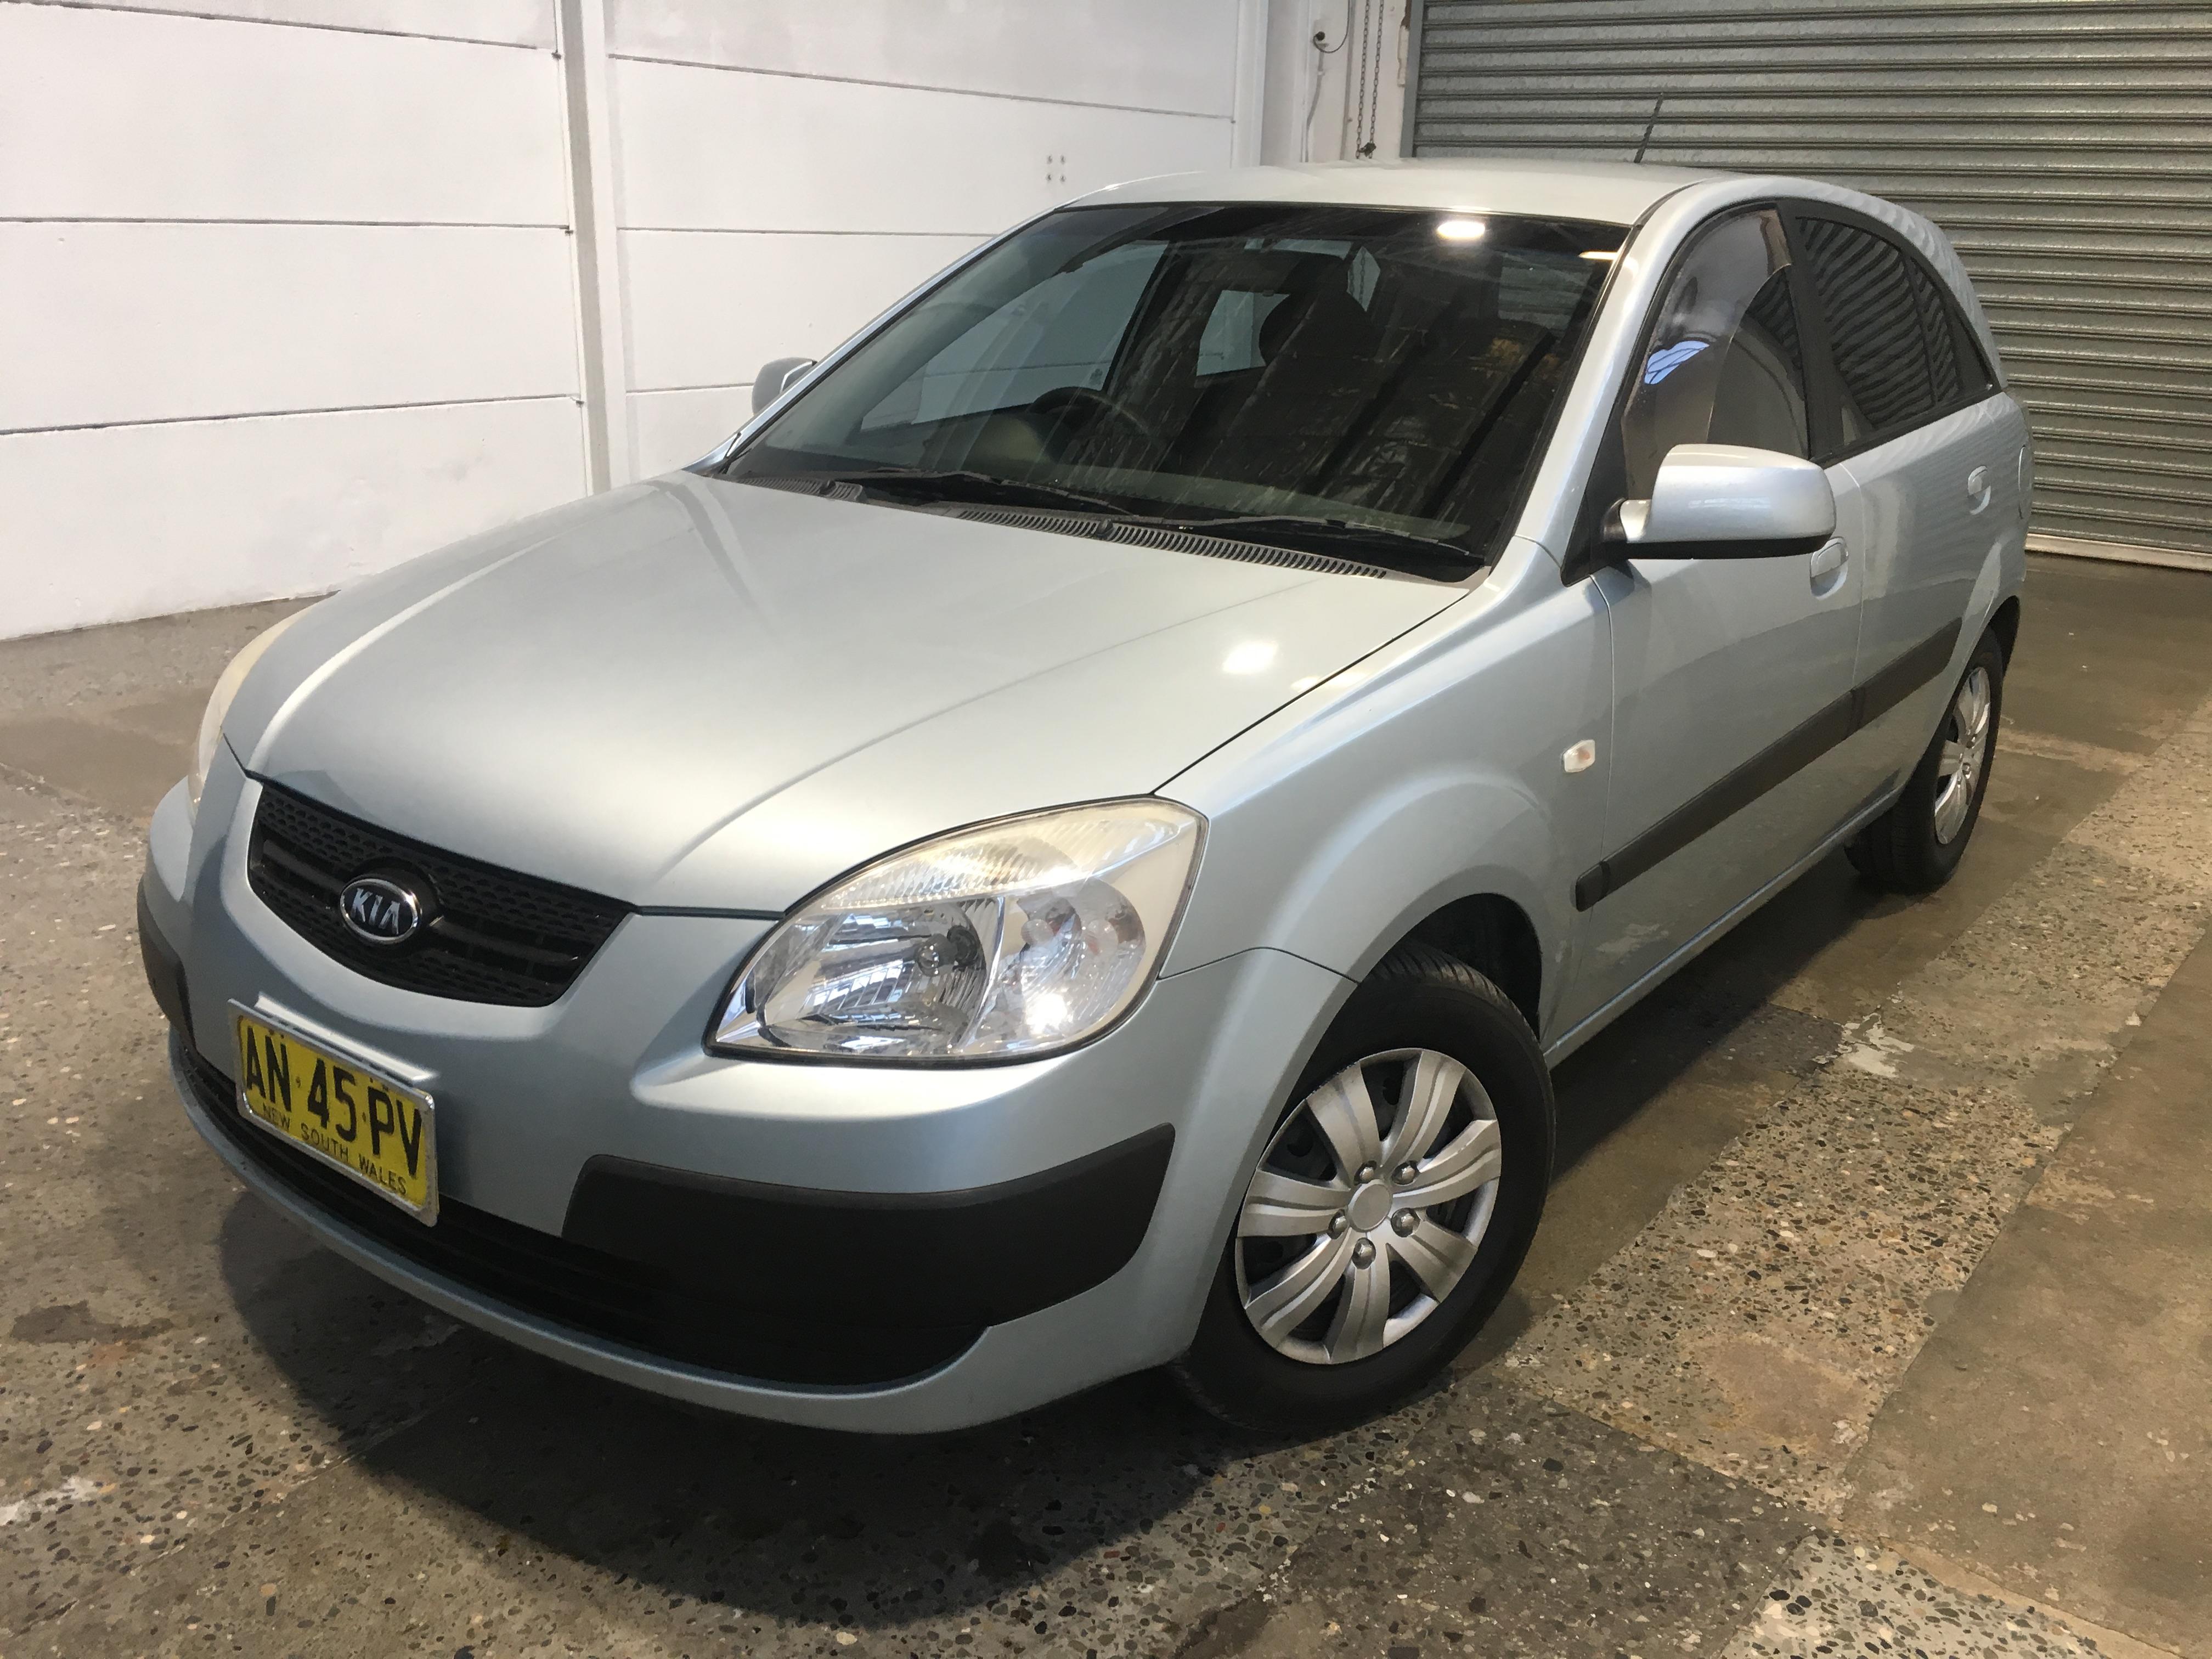 ex military vehicles for sale australia | Graysonline